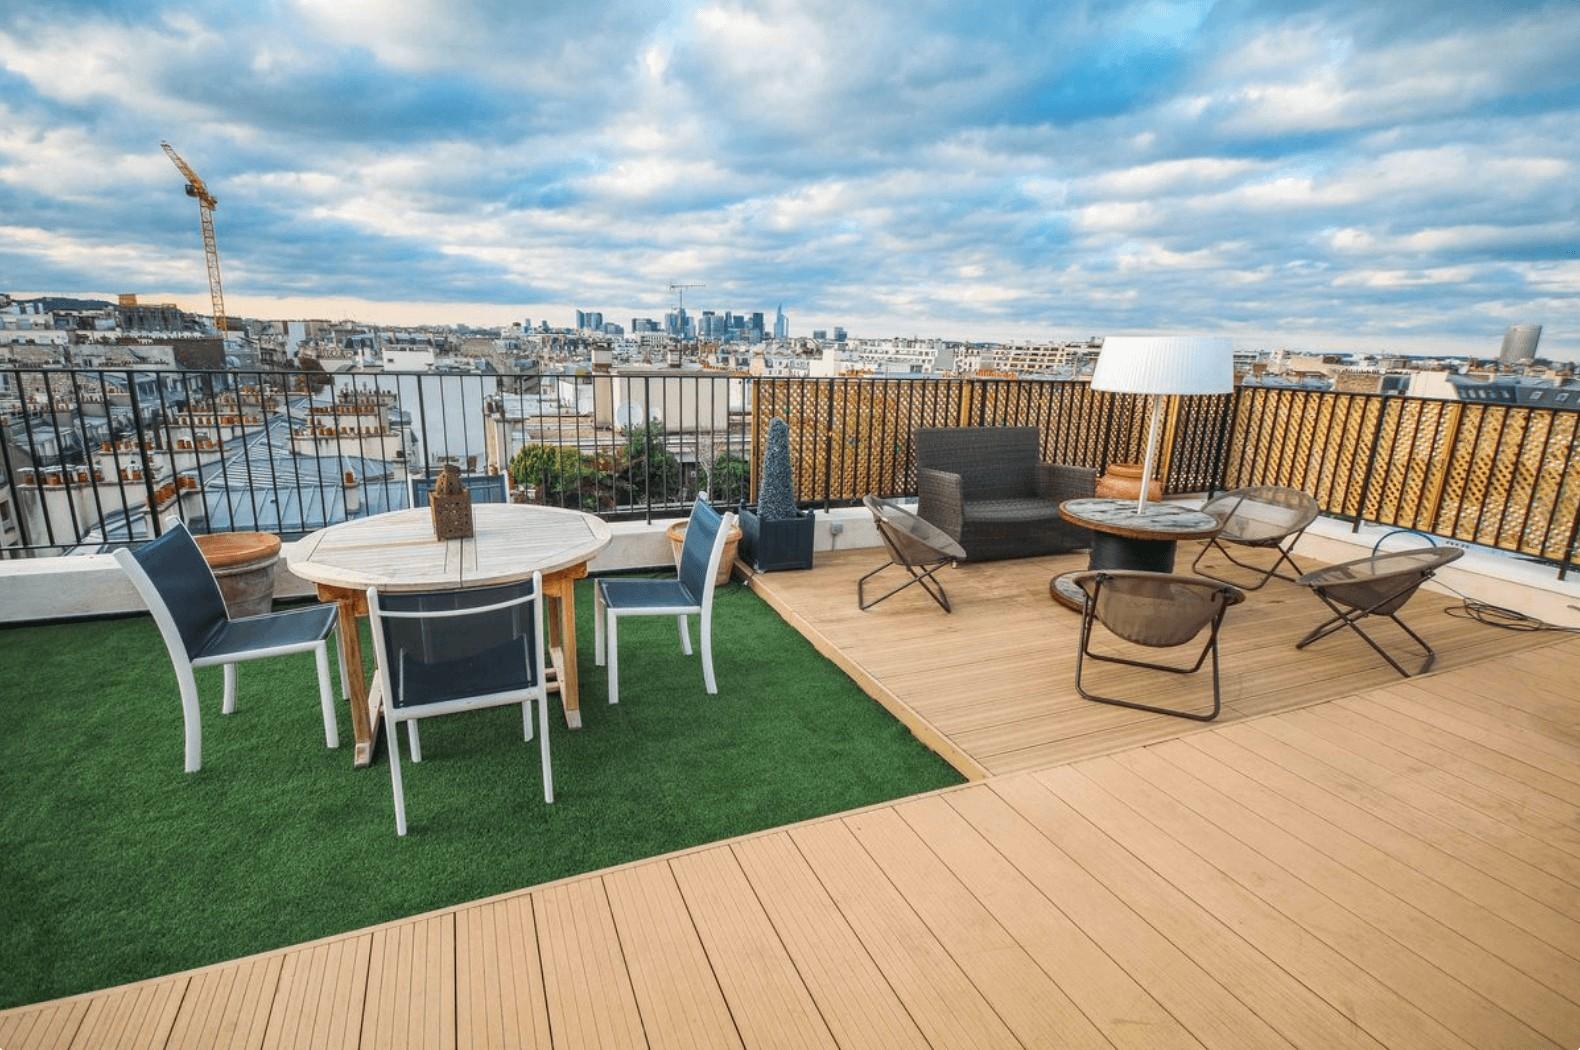 reunion rooftop terrasse paris